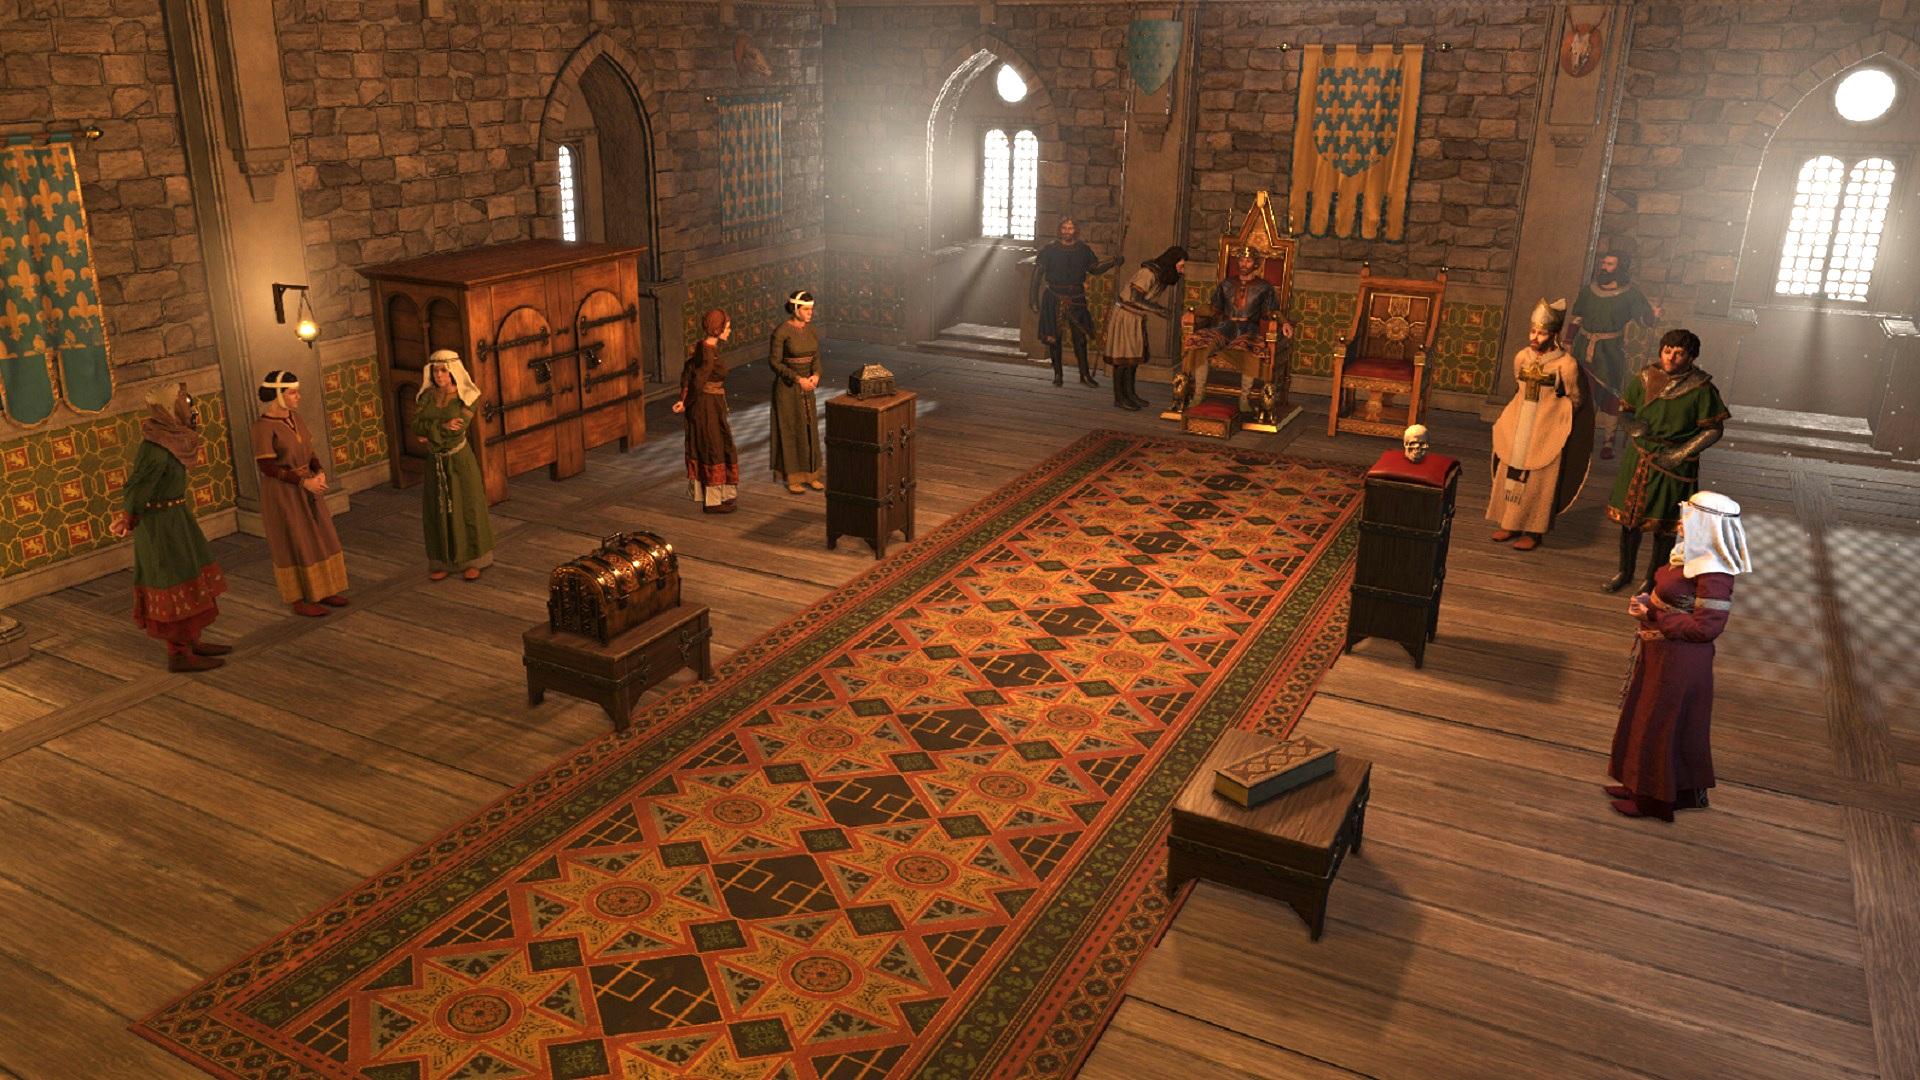 Crusader Kings 3's Royal Court expansion will take longer than originally planned